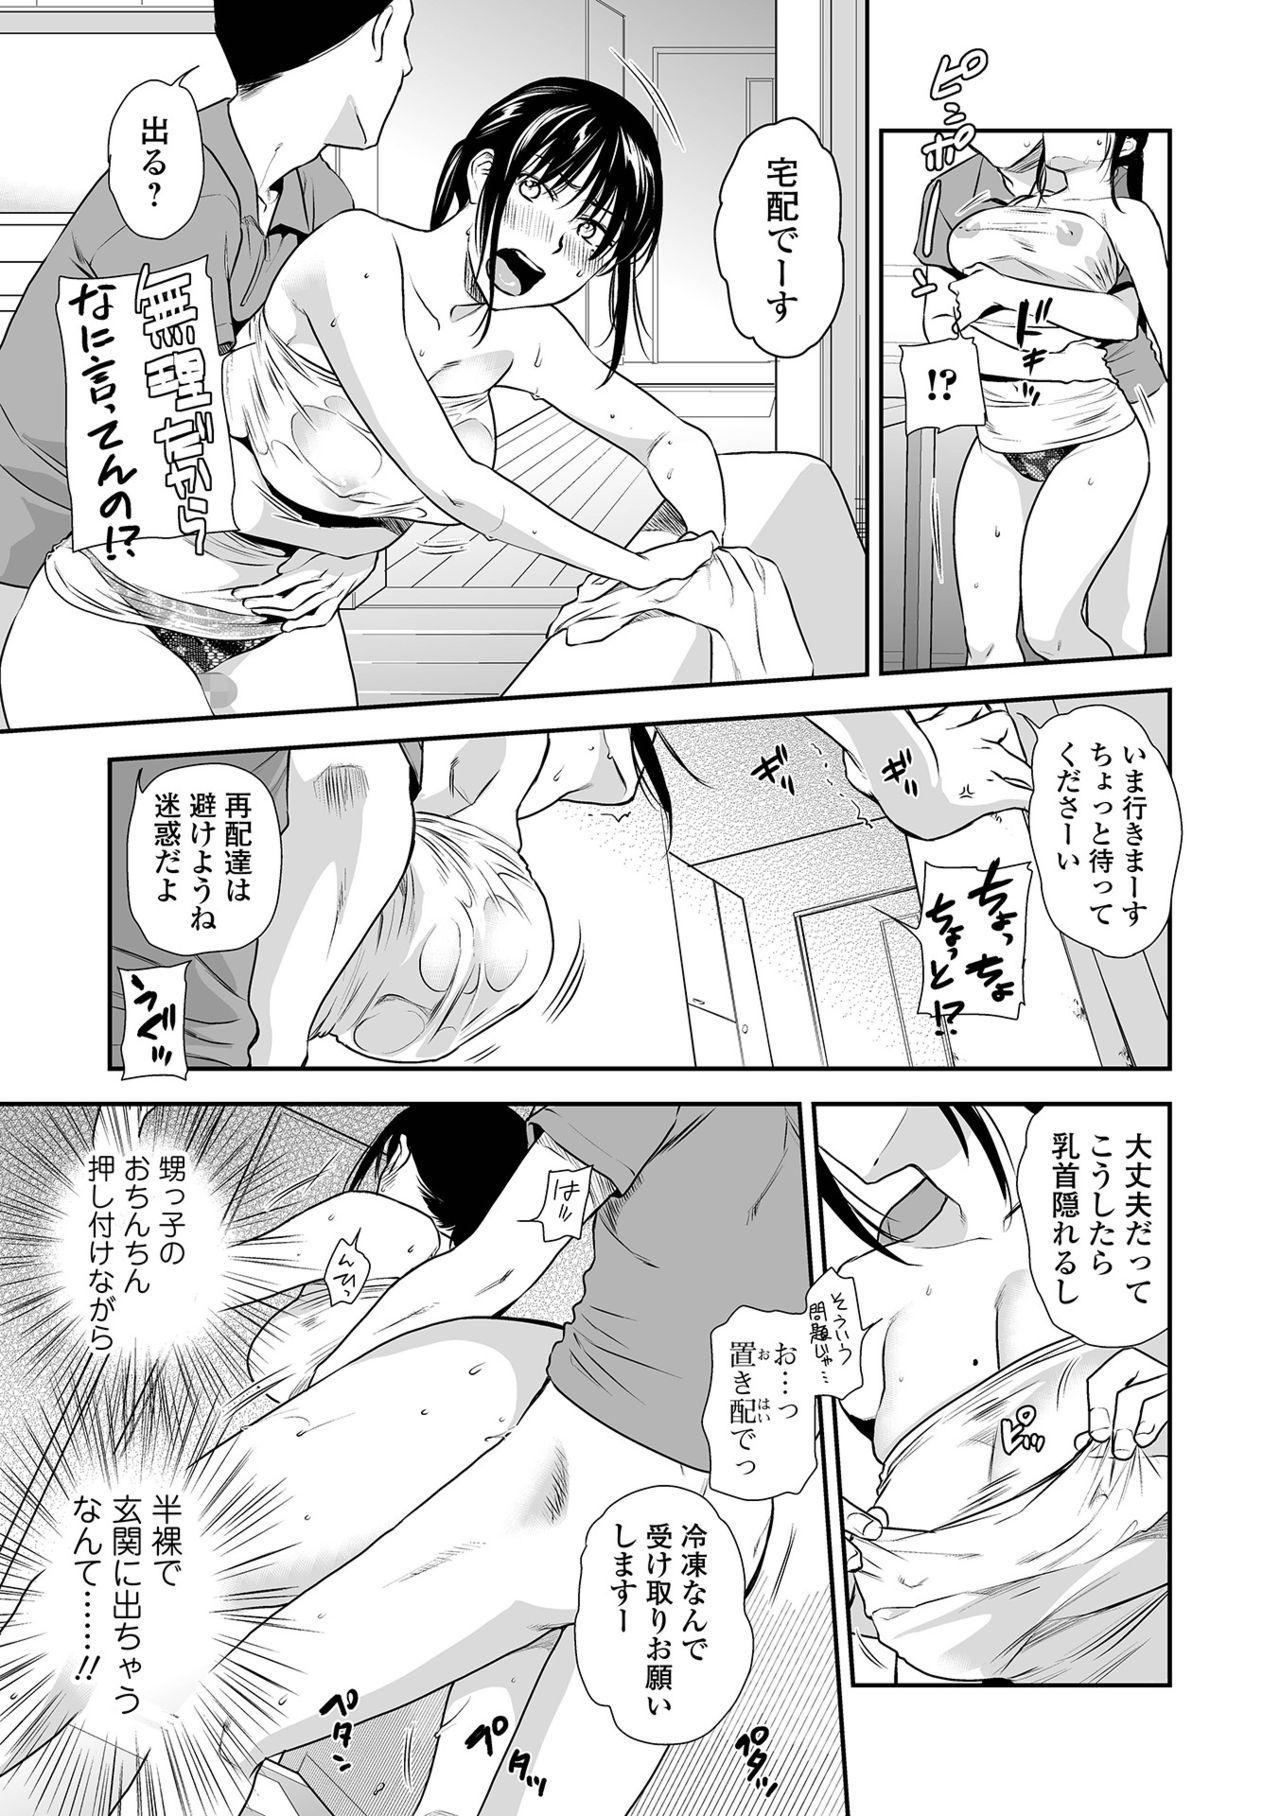 COMIC Shigekiteki SQUIRT!! Vol. 25 134